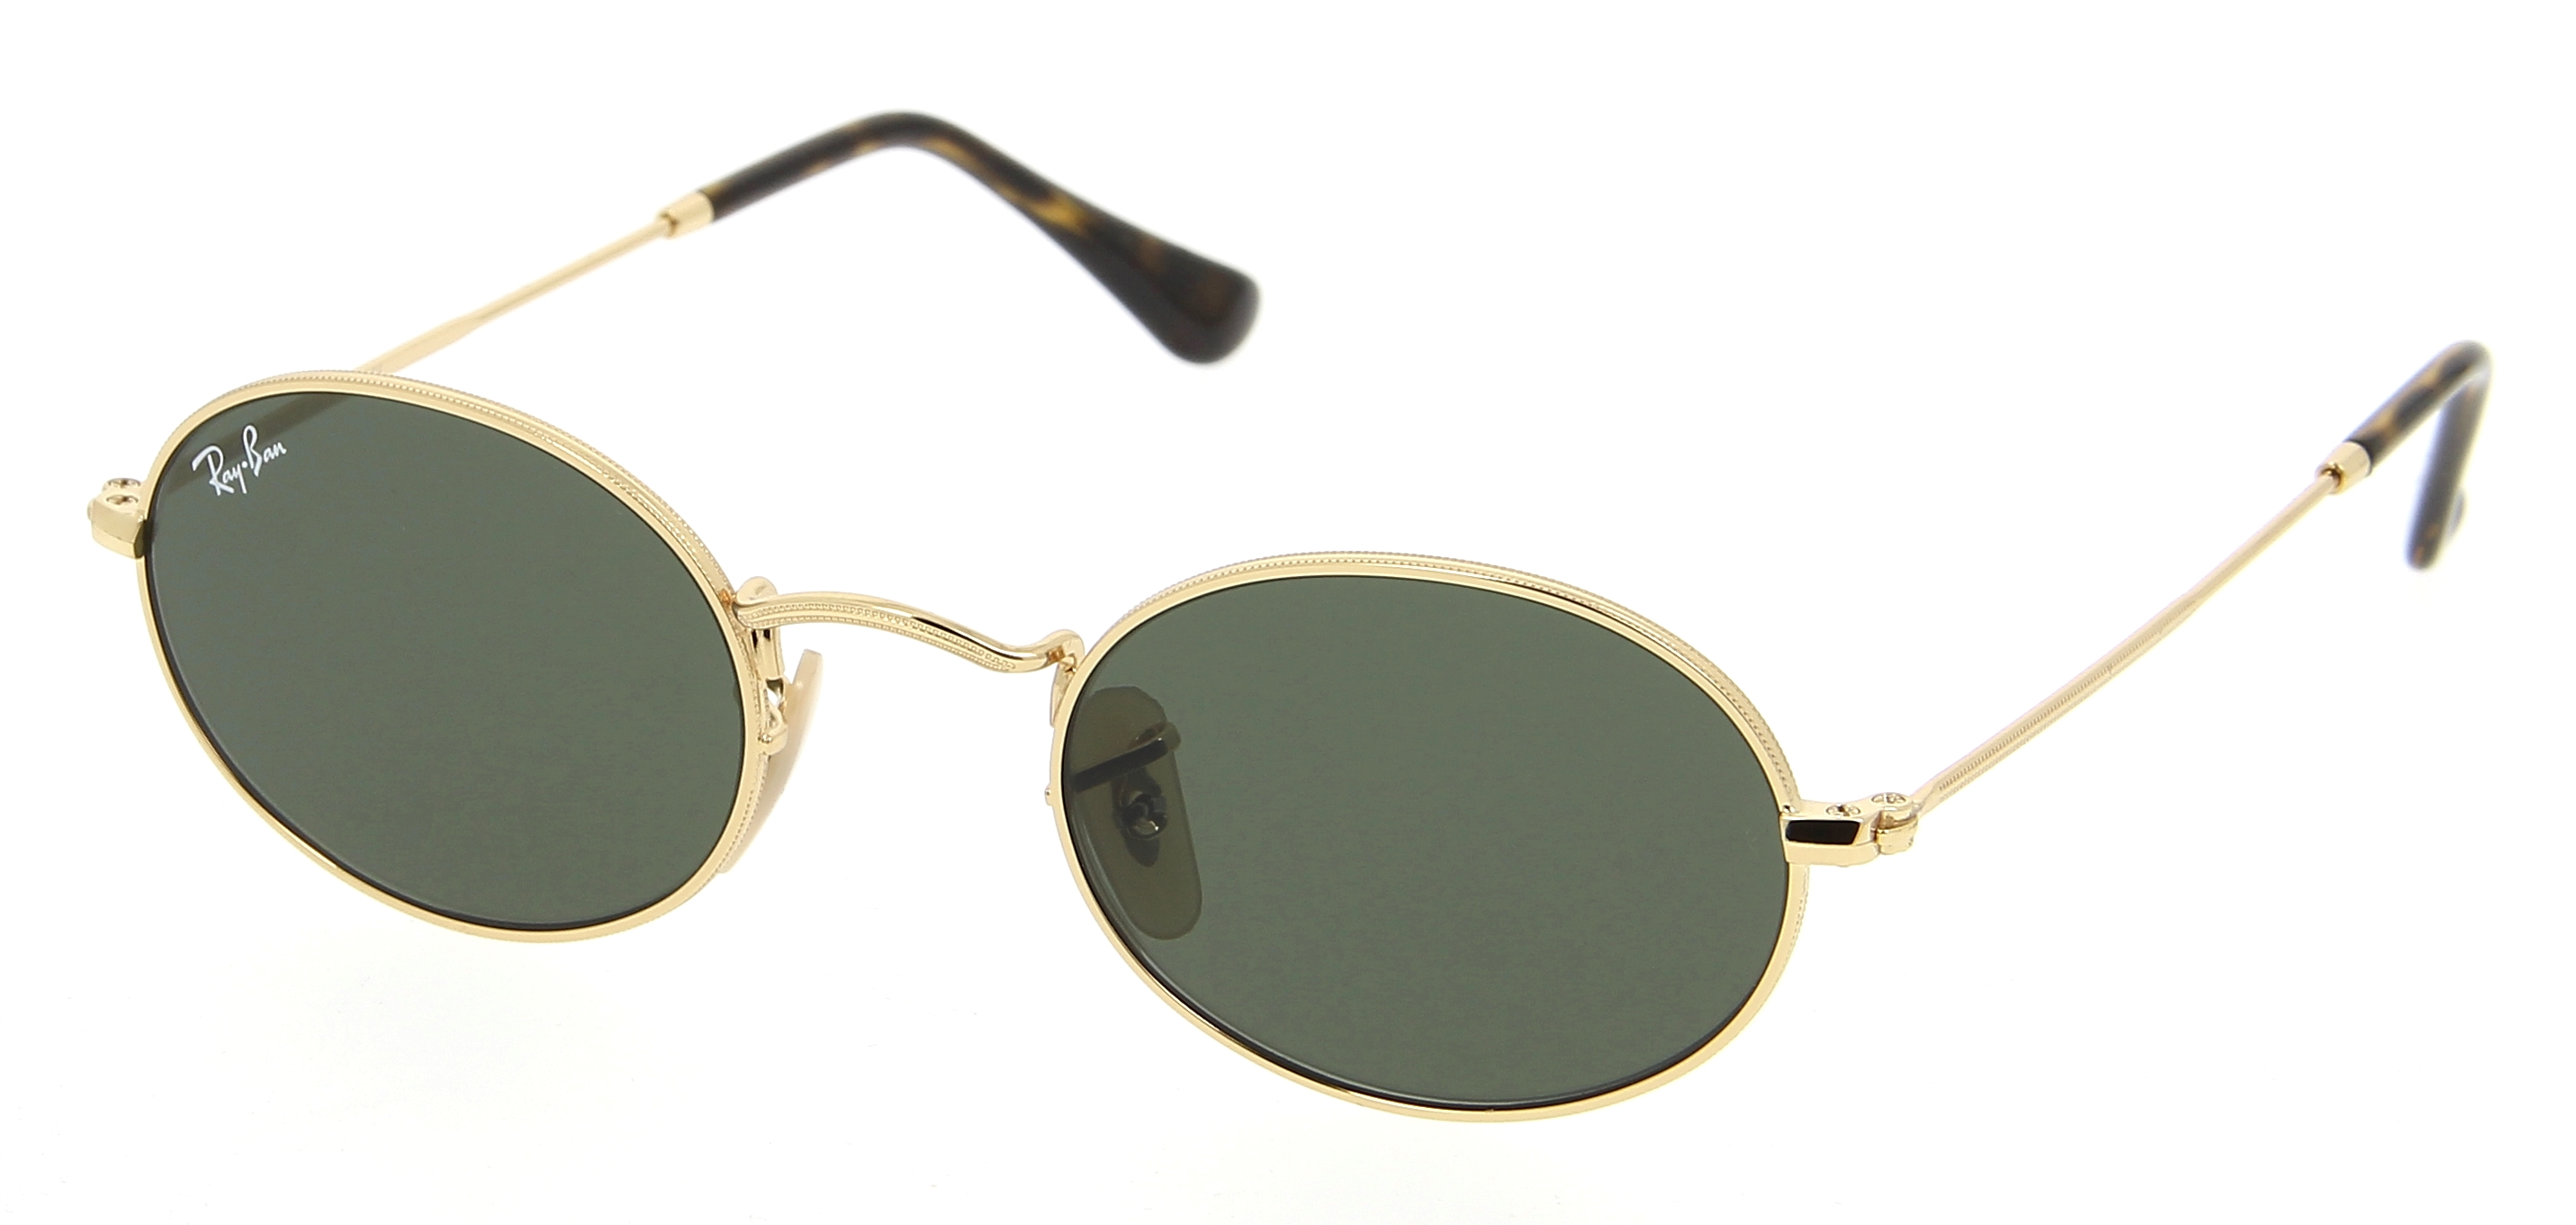 Lunettes de soleil RAY-BAN RB 3547N 001 Oval Flat Lenses